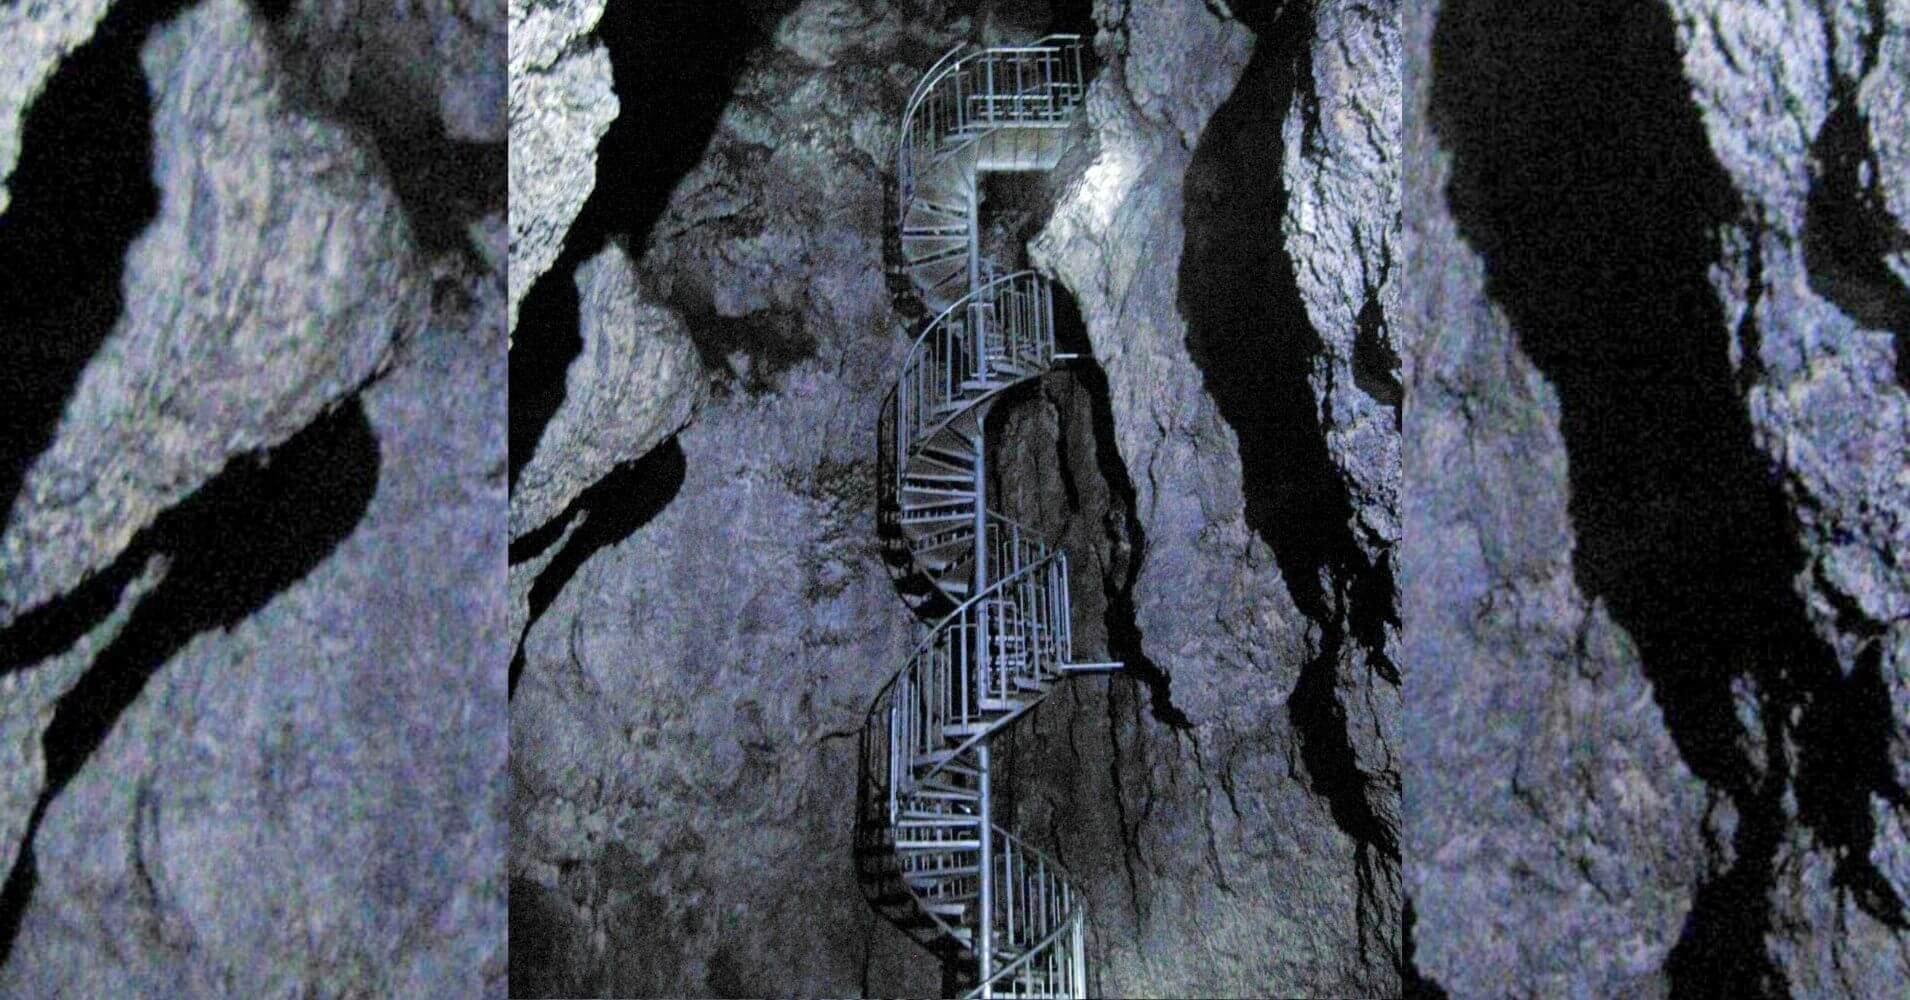 Interior de la Cueva de Vatnshellir. Parque Nacional Snaefells. Hellnar, Vesturland. Islandia.